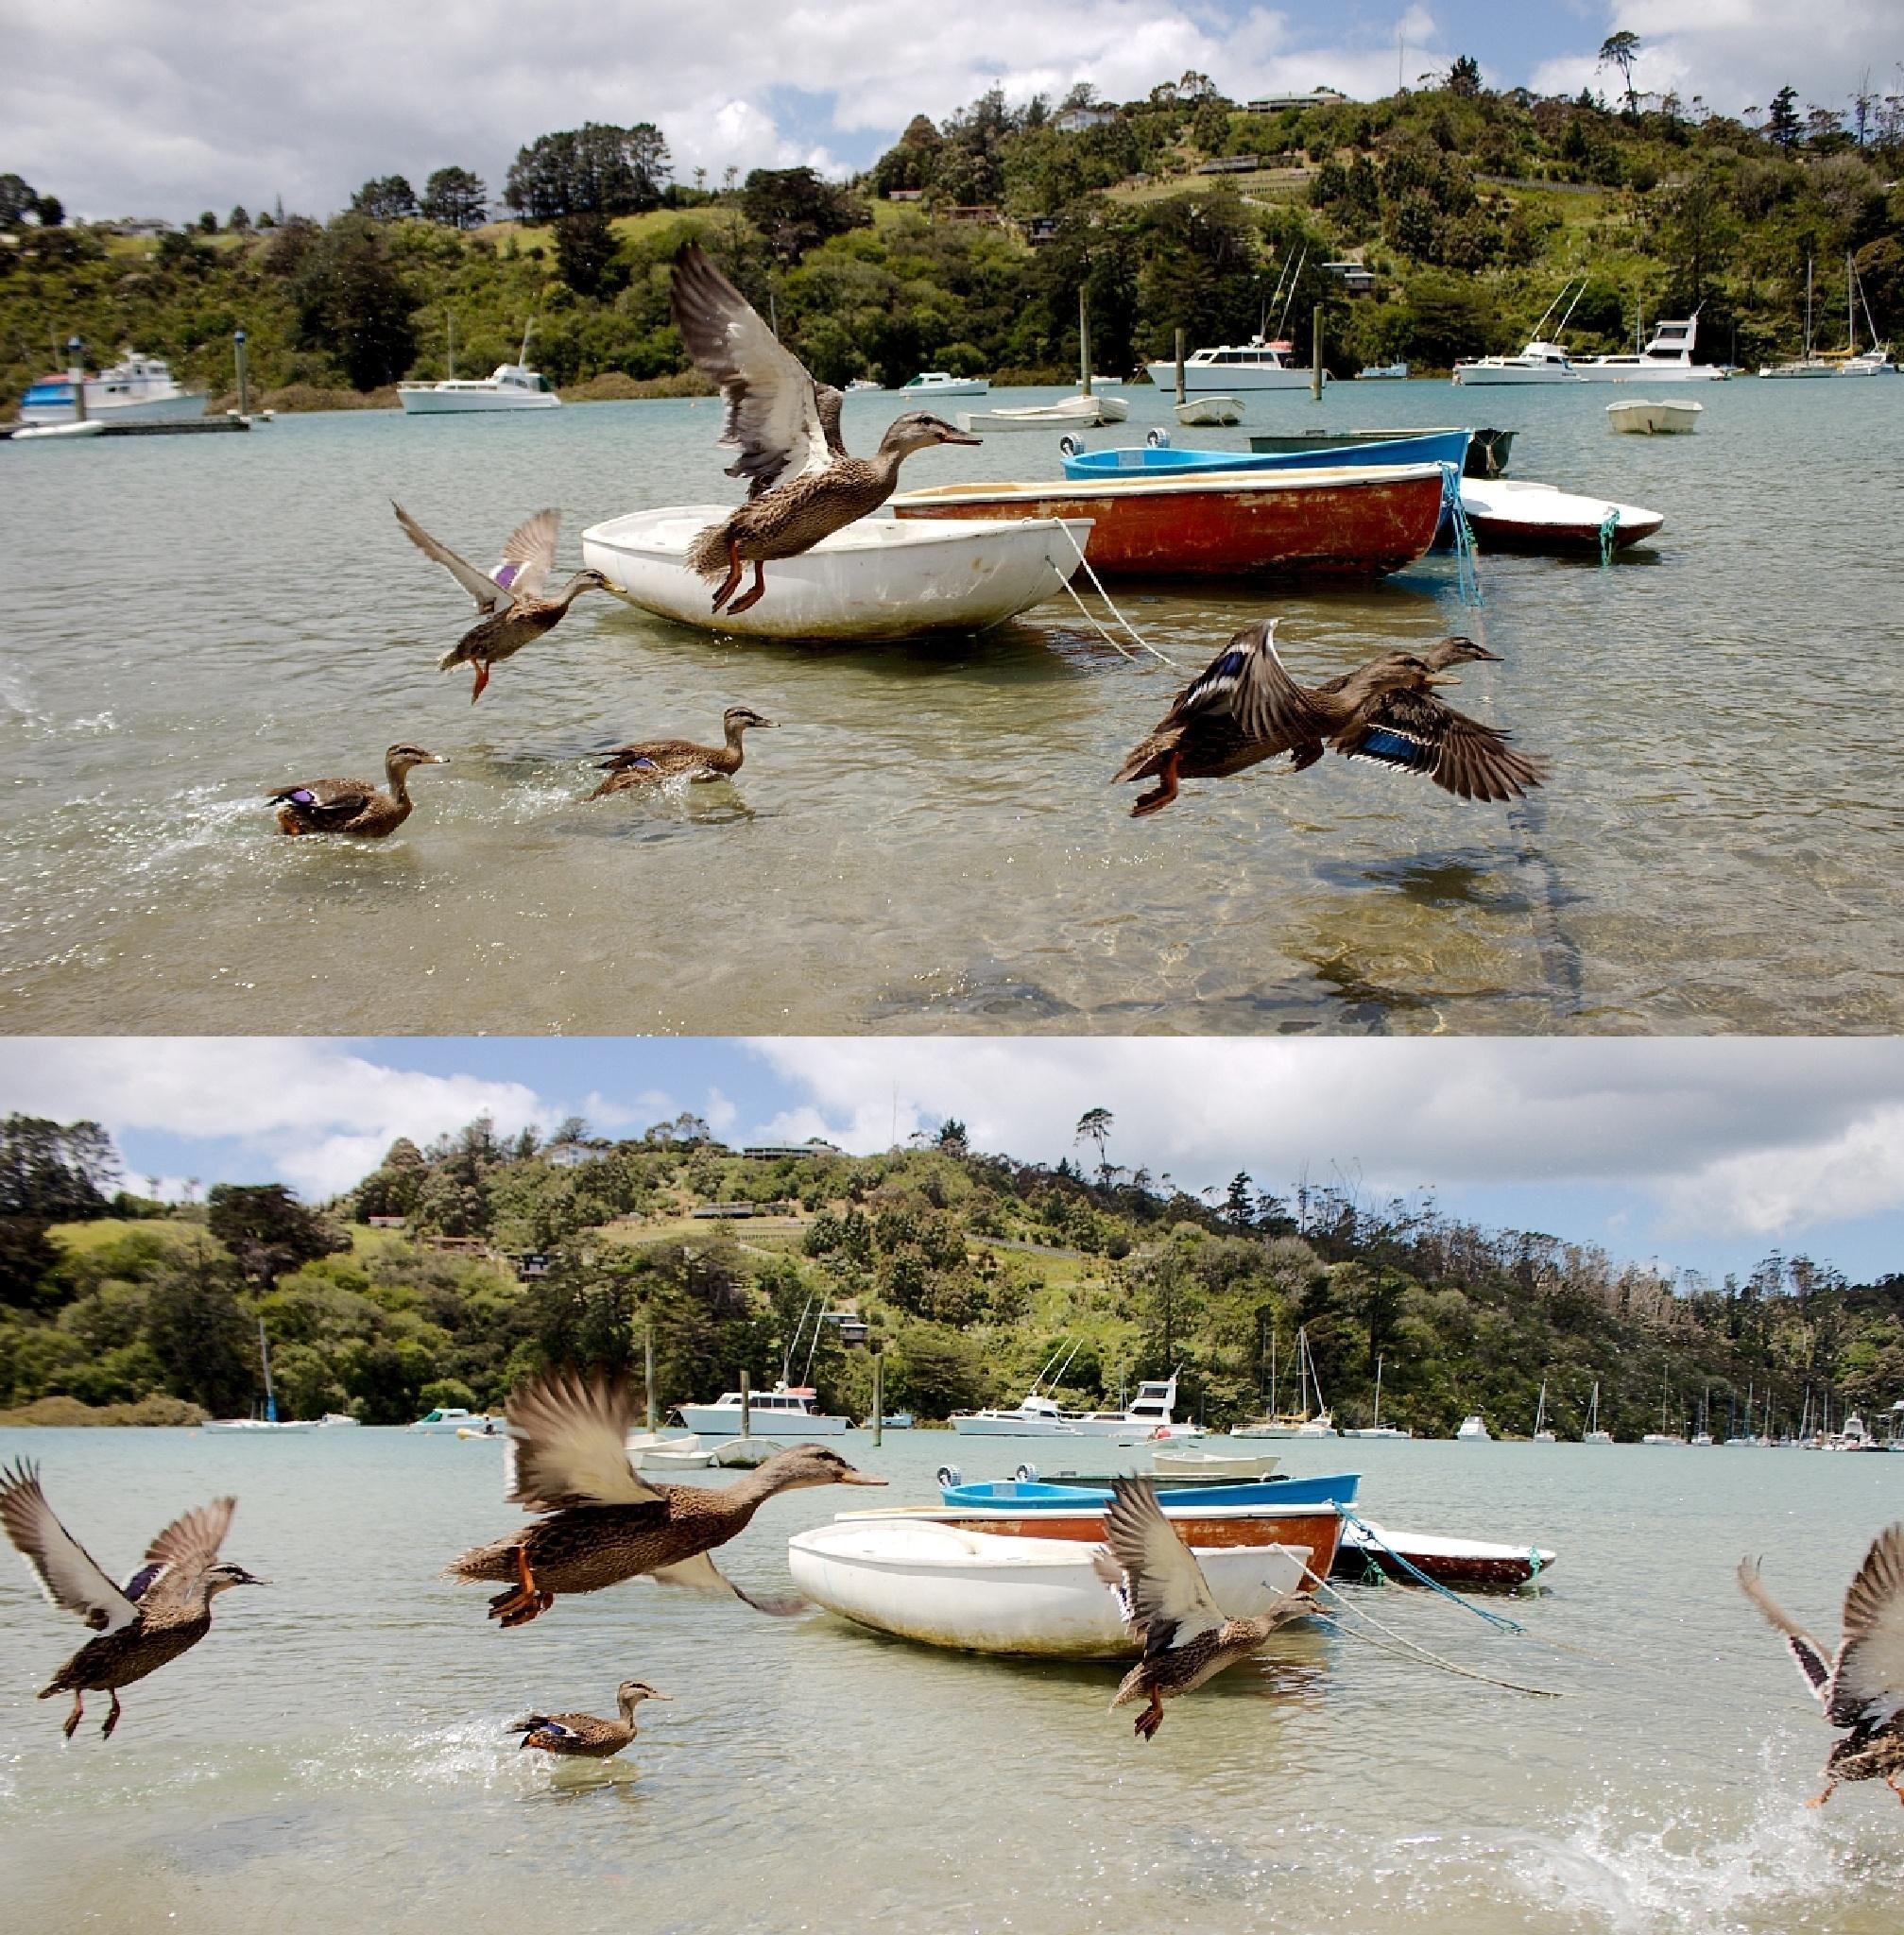 Double Duck Mayhem by Simons Photography